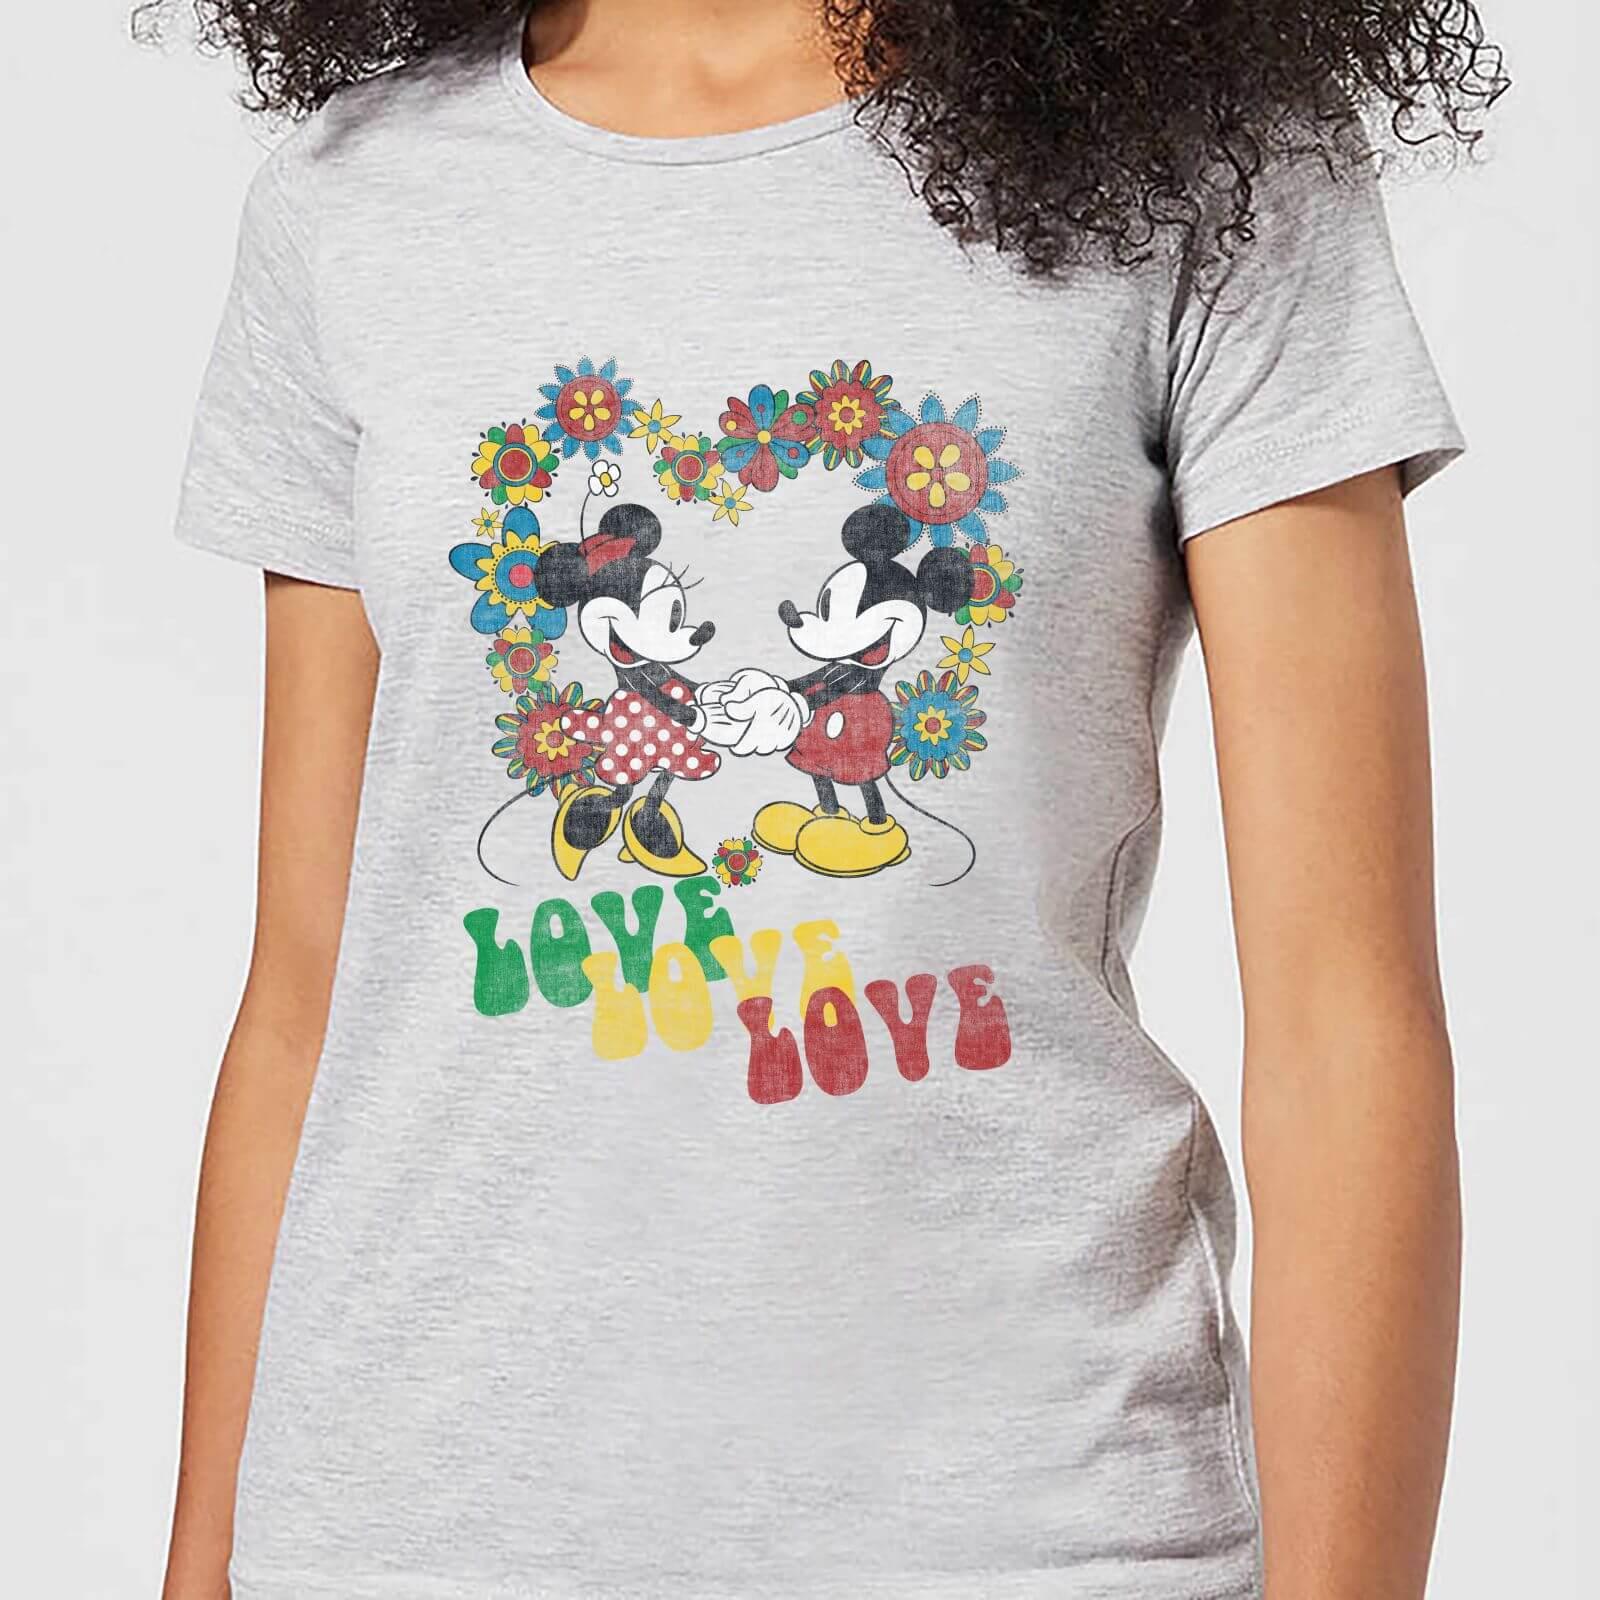 Disney Mickey Mouse Hippie Love Women's T-Shirt - Grey - XS - Grey